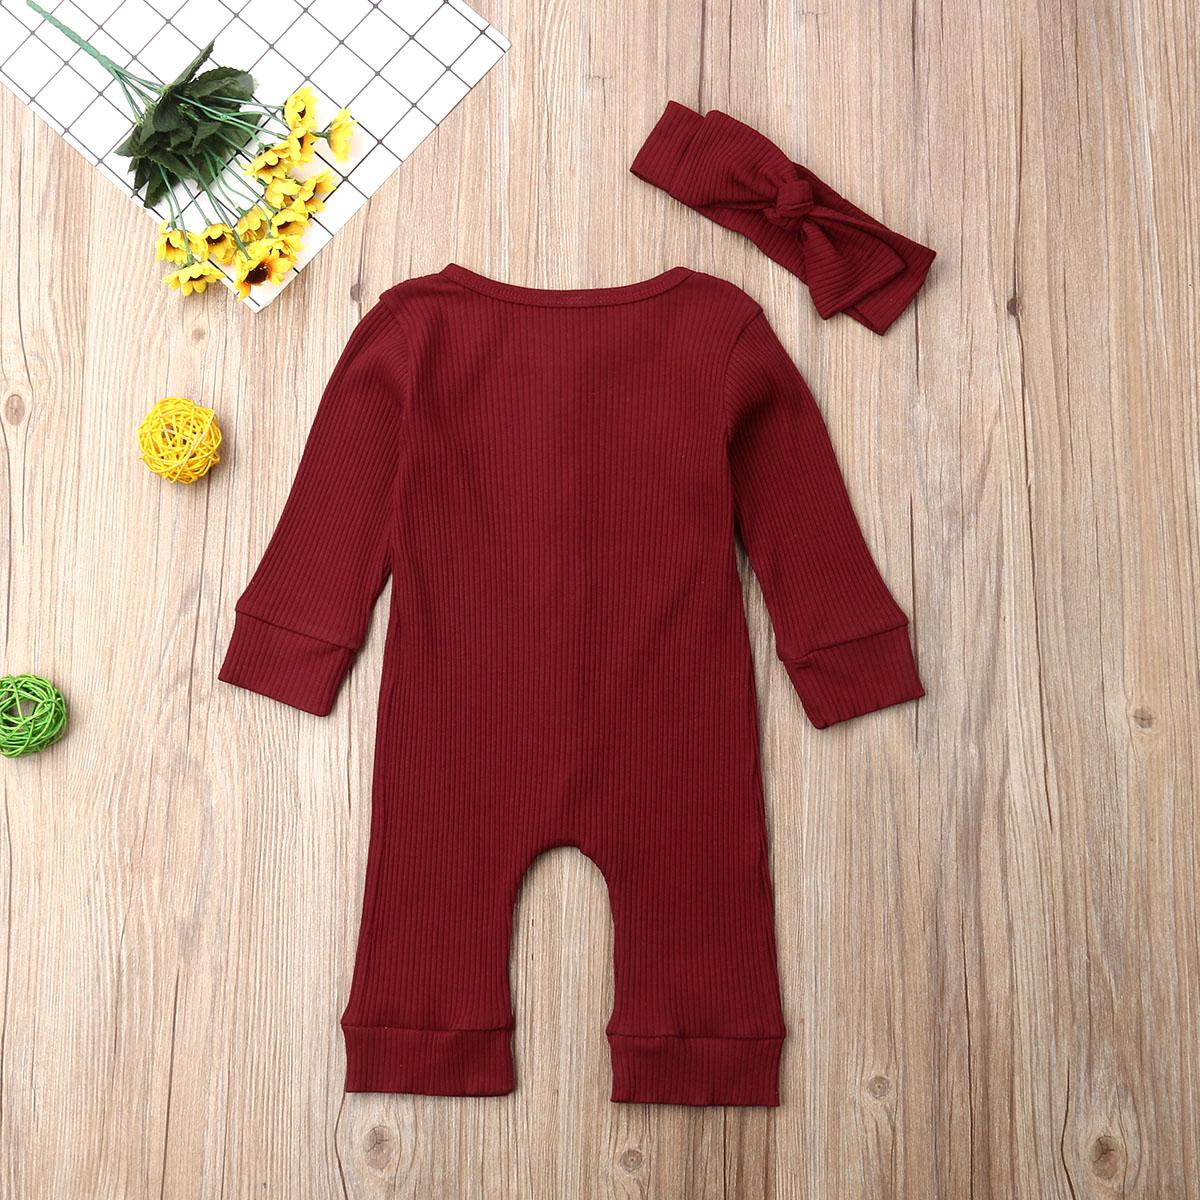 He5f158170ed249c0b0c851cb93ba74ddZ Spring Fall Newborn Baby Girl Boy Clothes Long Sleeve Knitted Romper + Headband Jumpsuit 2PCS Outfit 0-24M